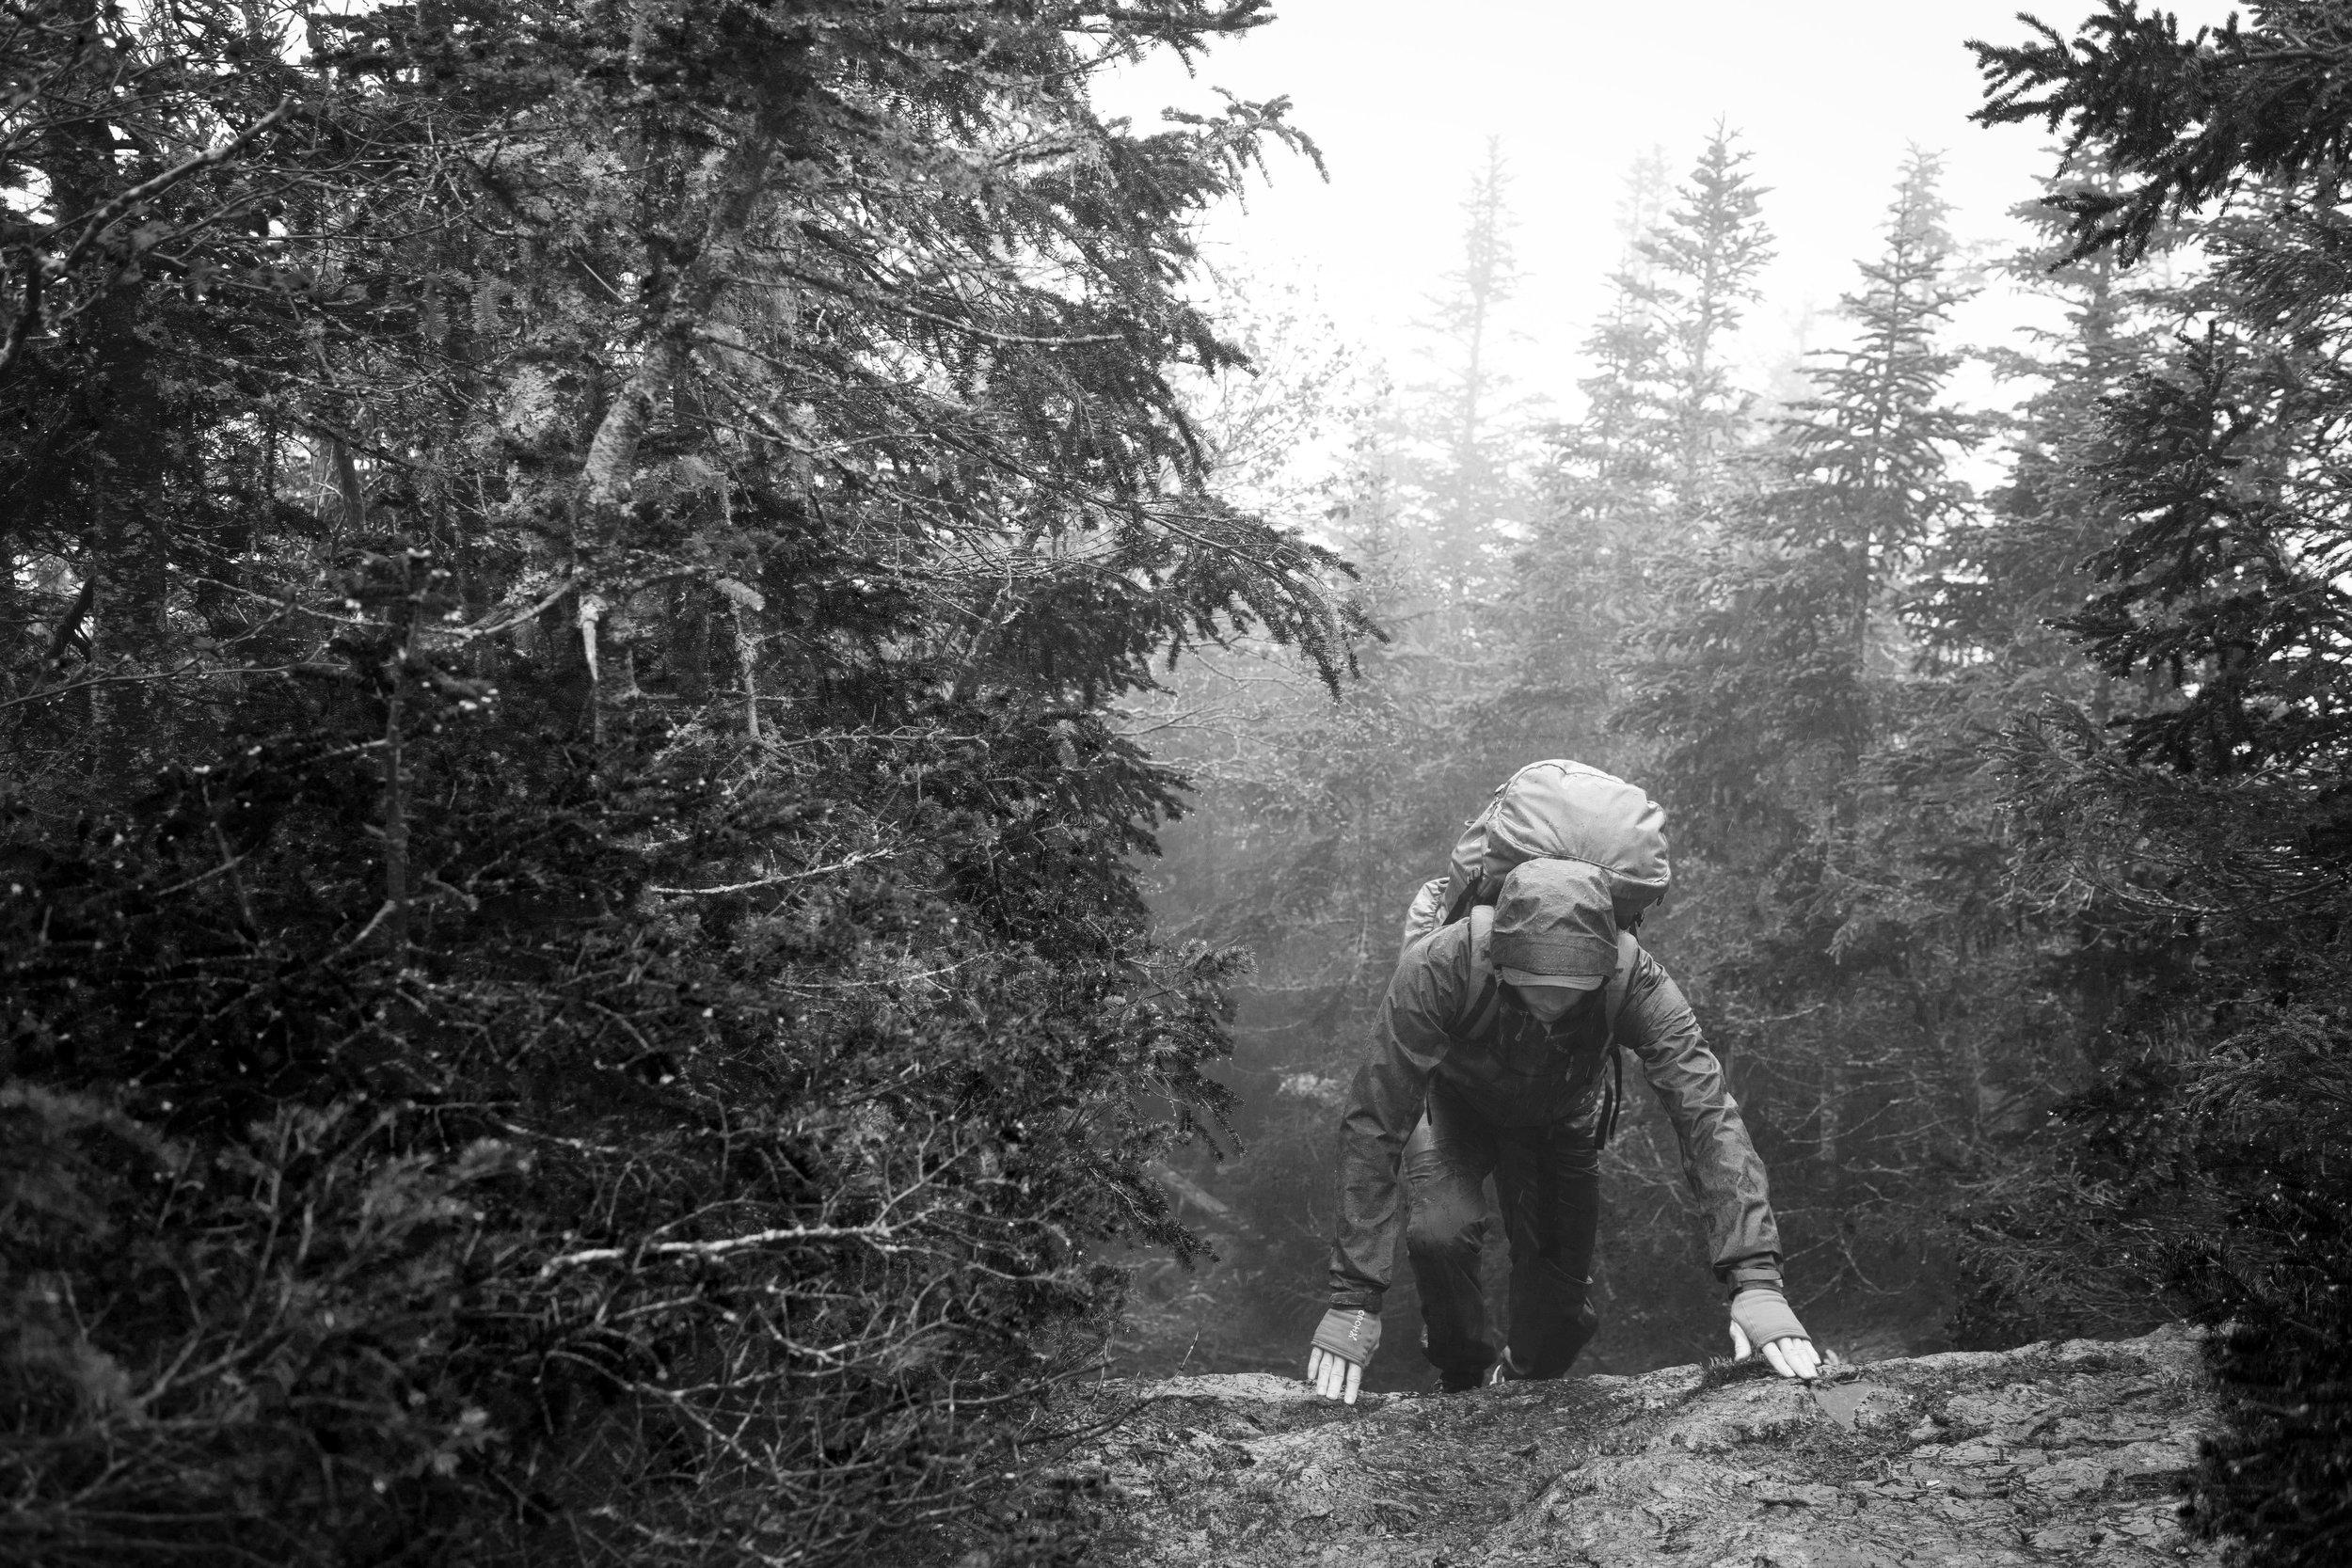 Houdini: Sustainable Sportswear #Savant - Photo: David Kvart / White Mountains New Hampshire USA